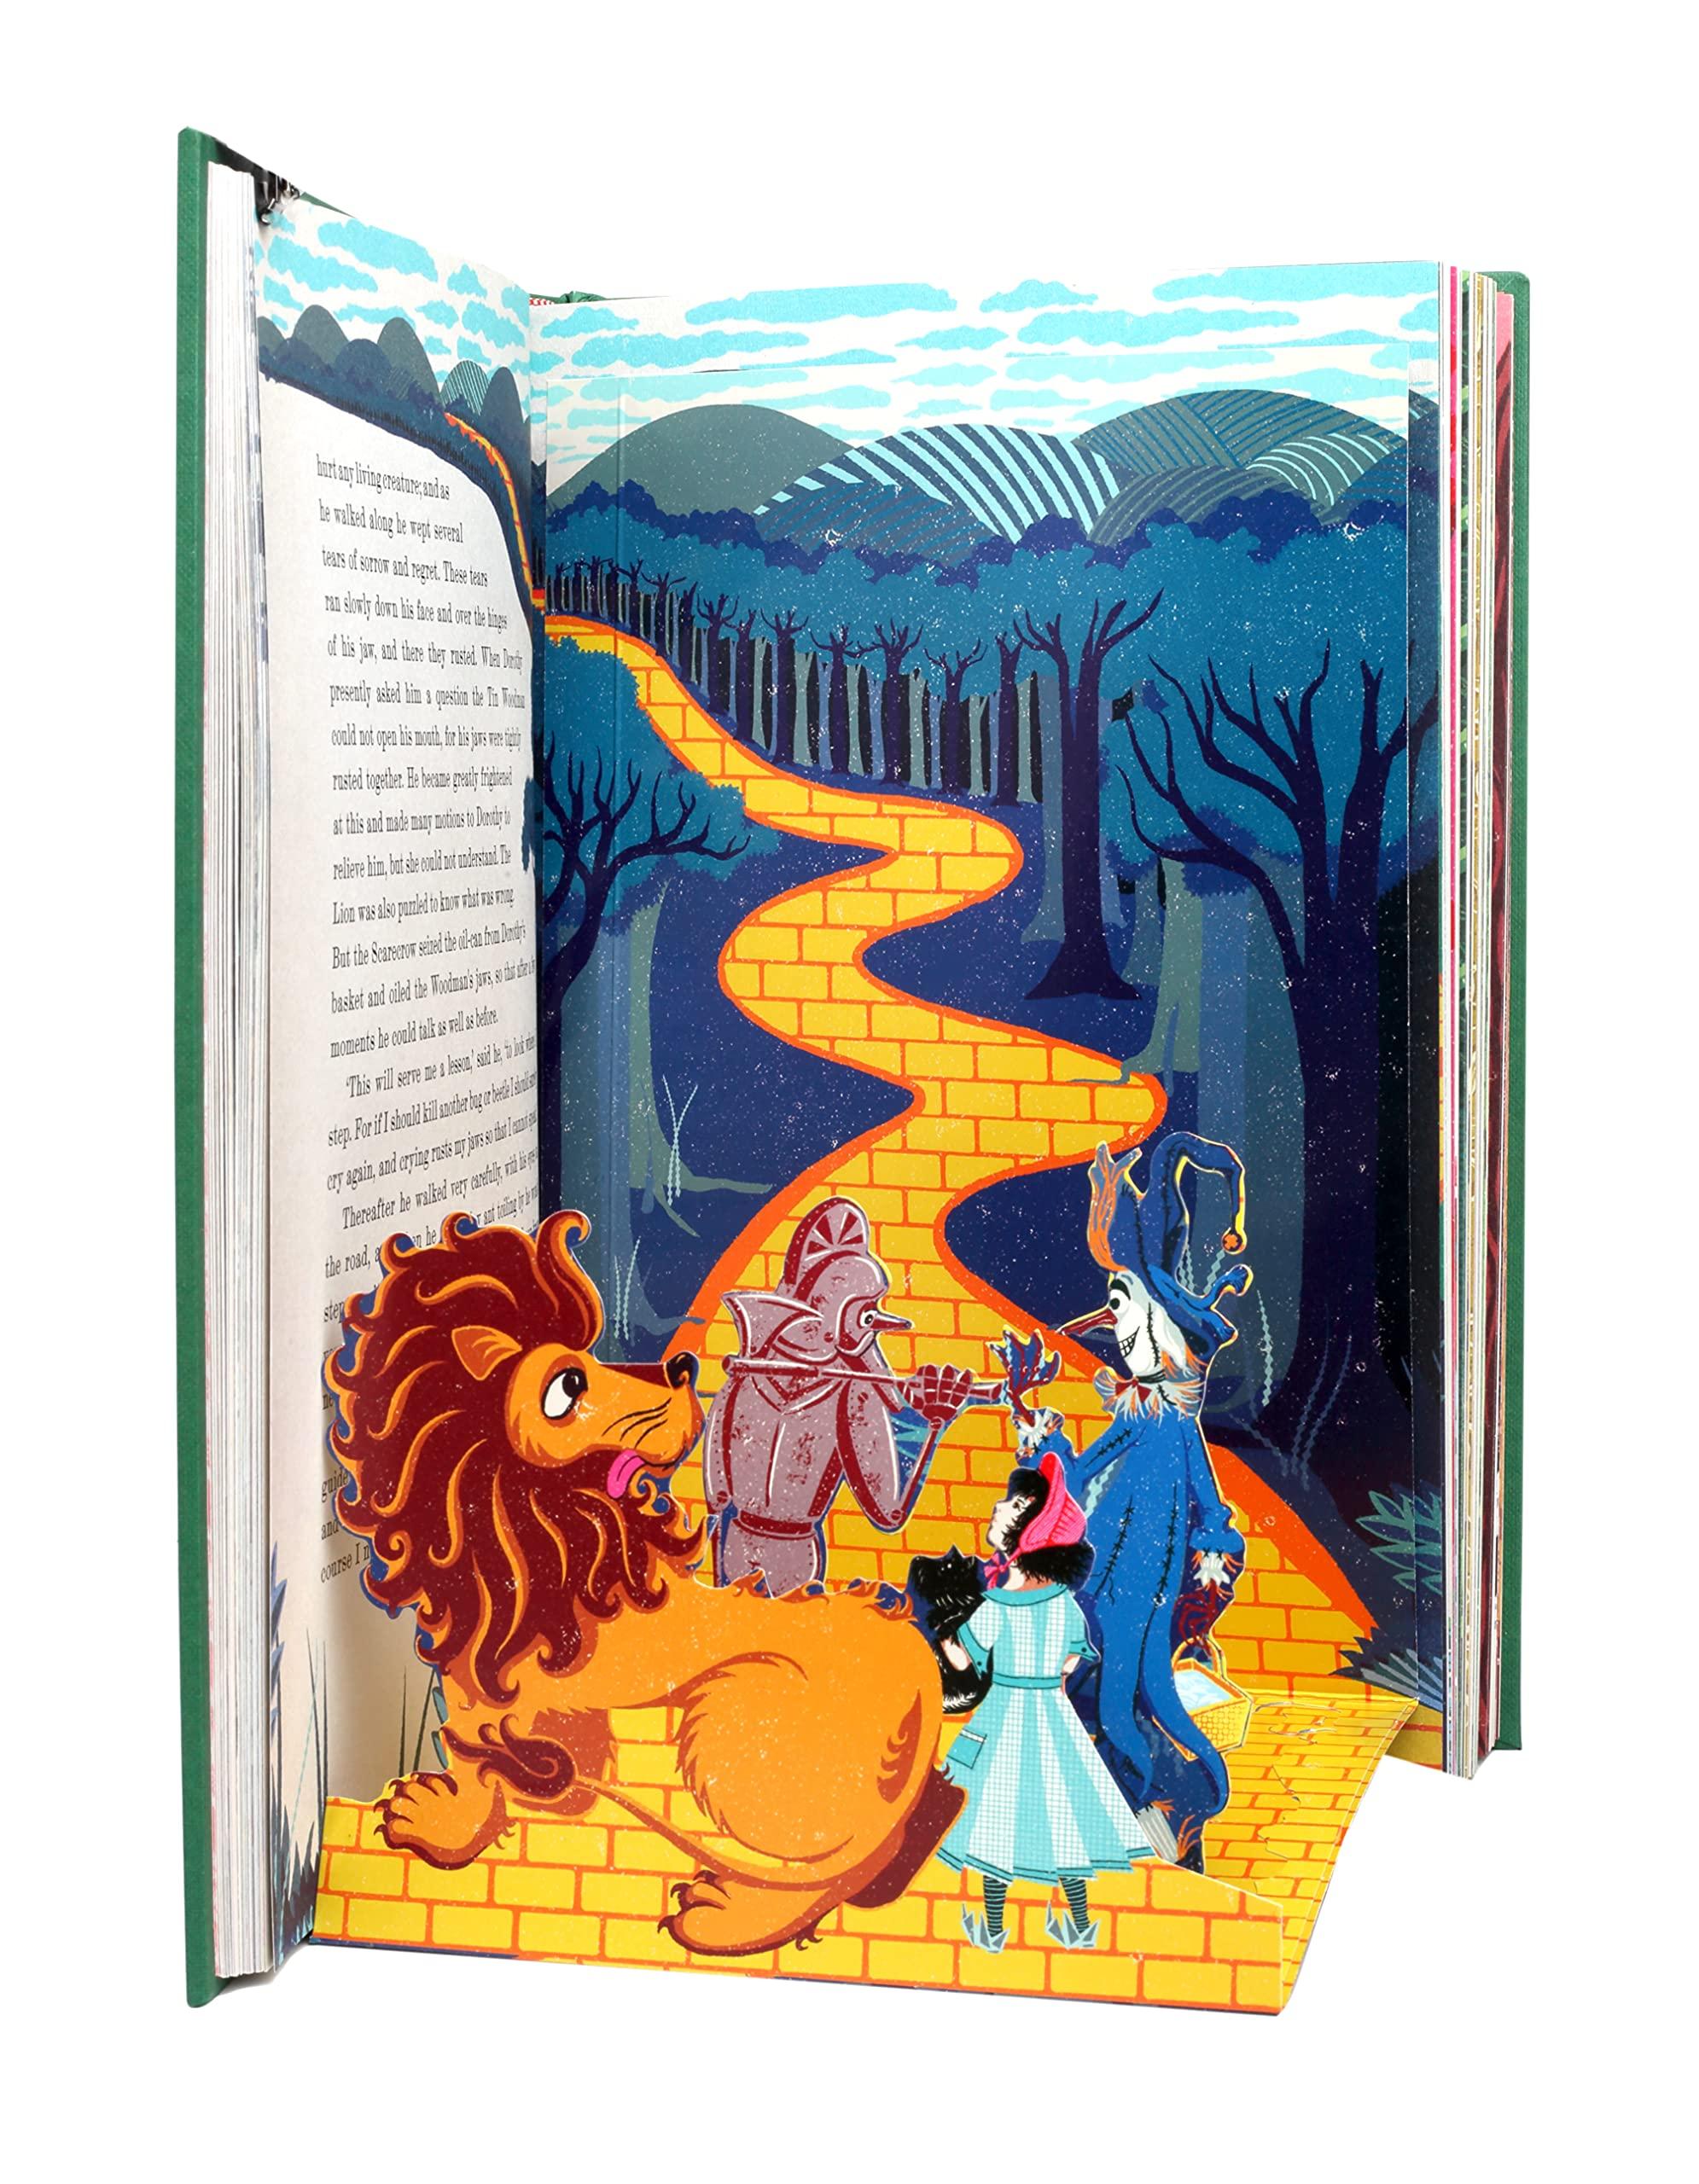 Wizard of Oz MinaLima d